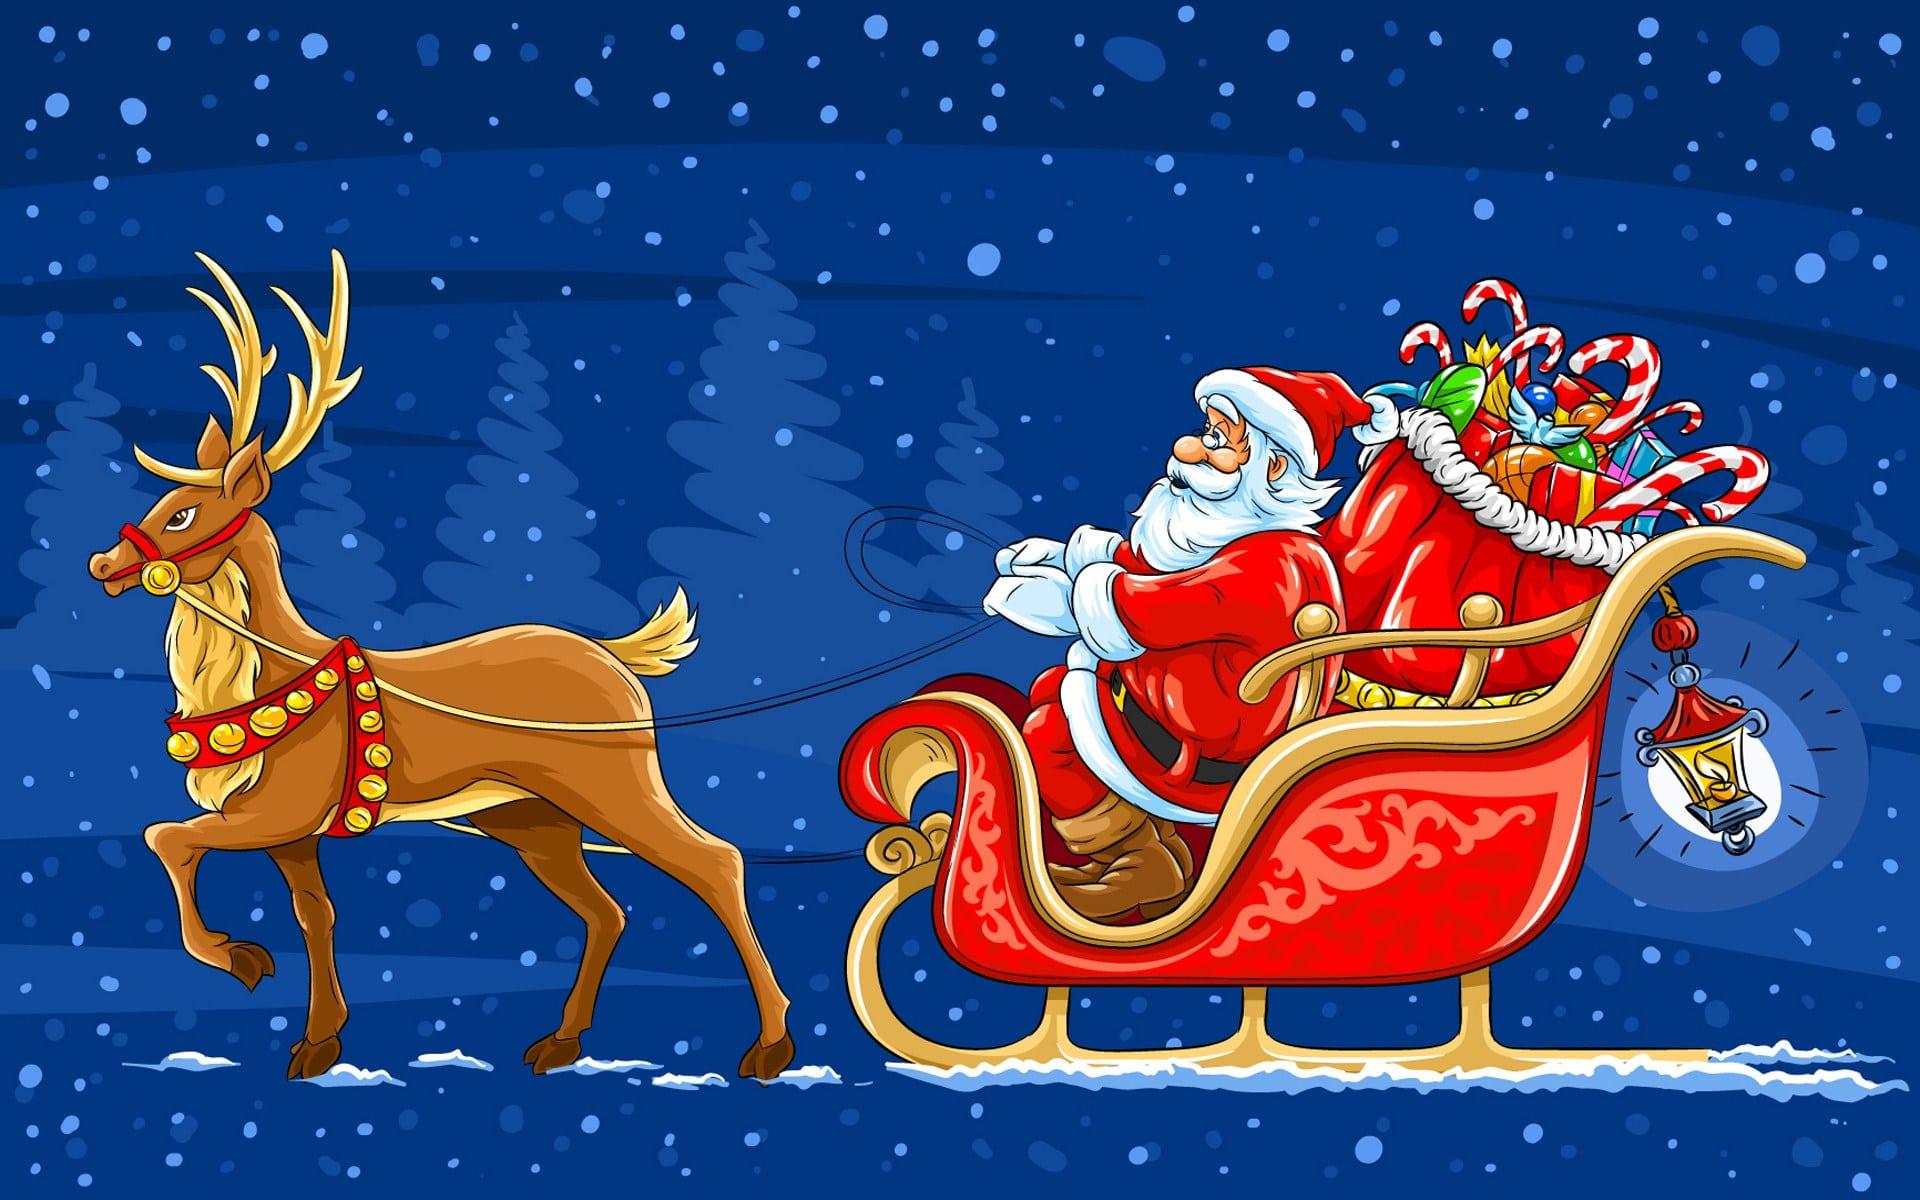 Santa Claus Wallpapers hd